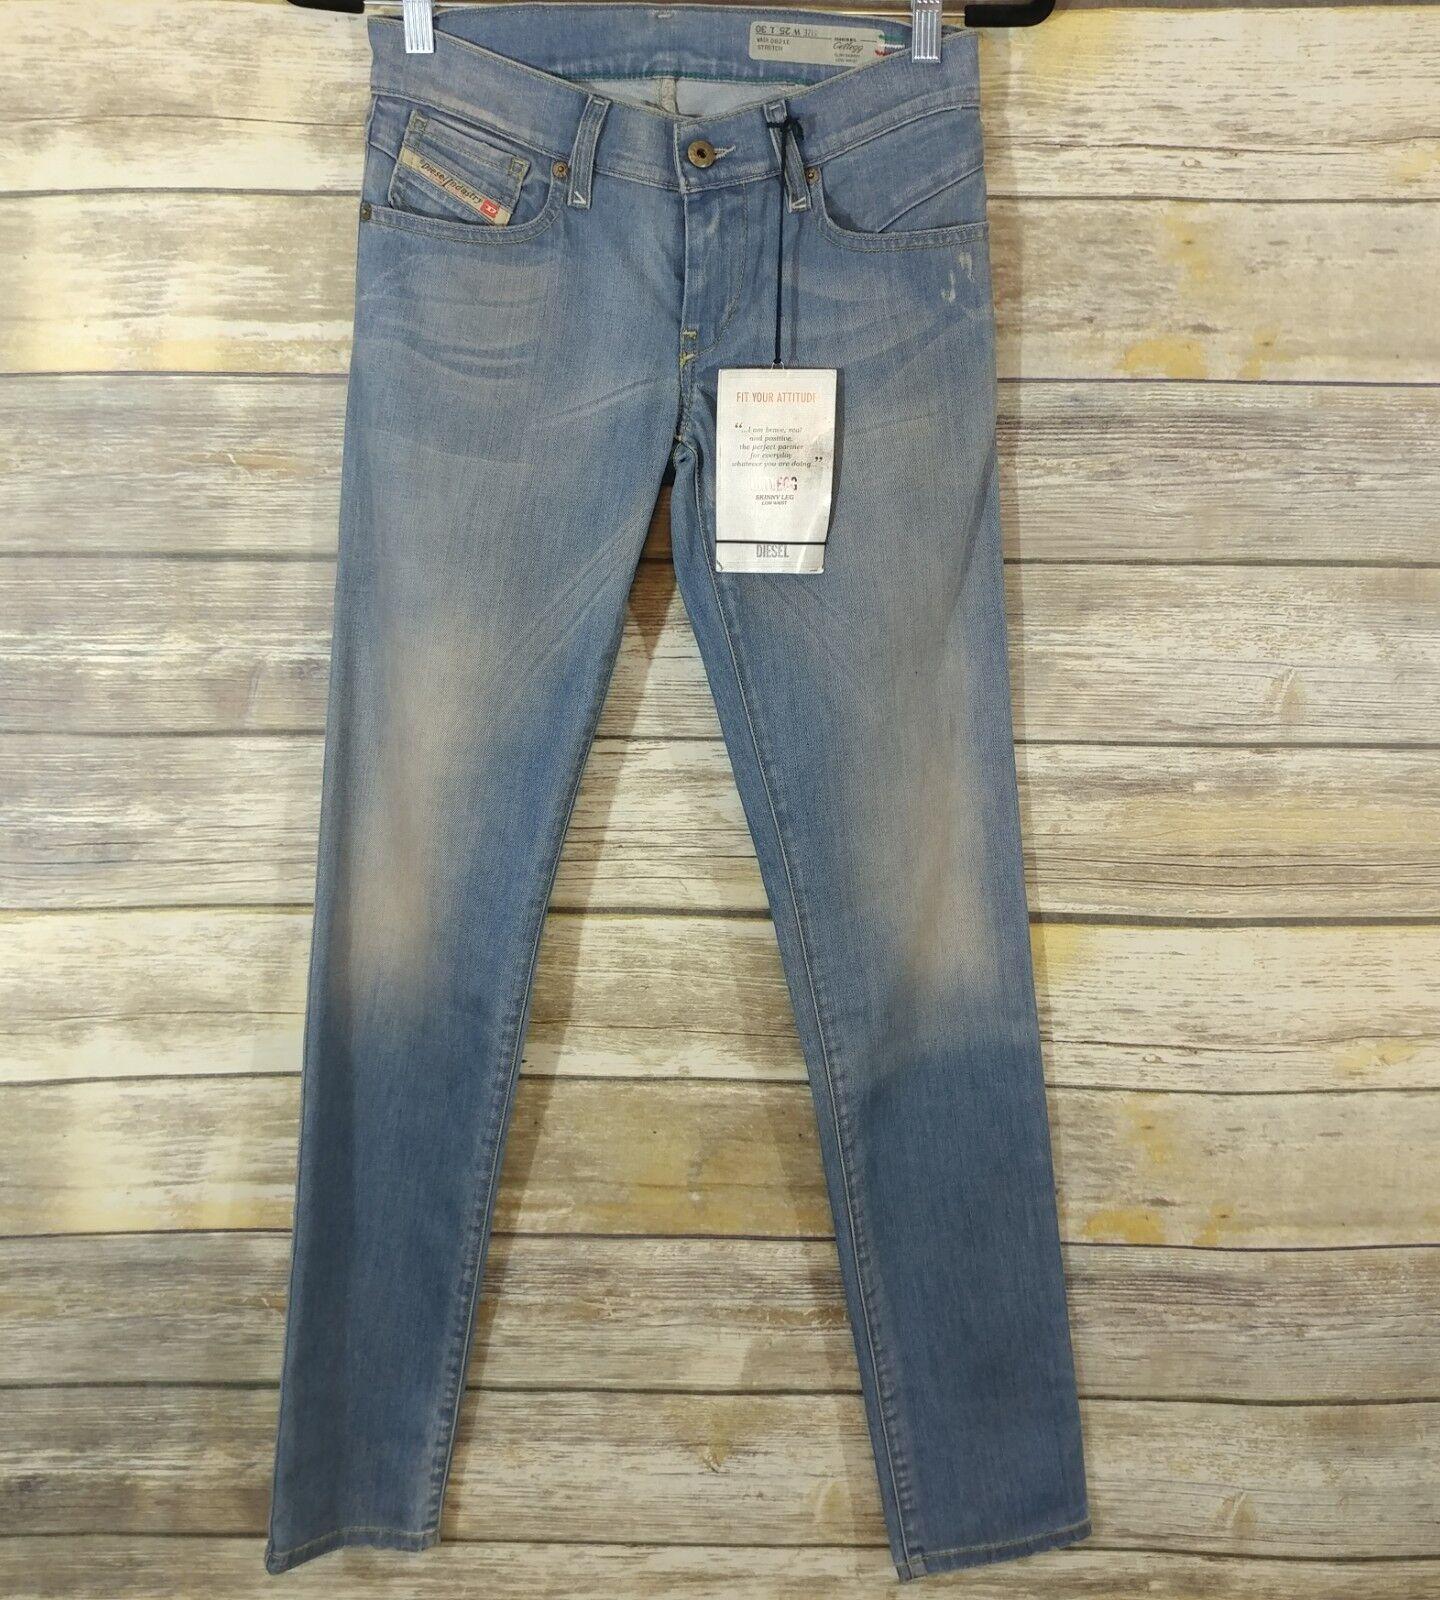 298 NEW Diesel Jeans Getlegg W25xL30 Slim Skinny 0821E Low Waist ITALY